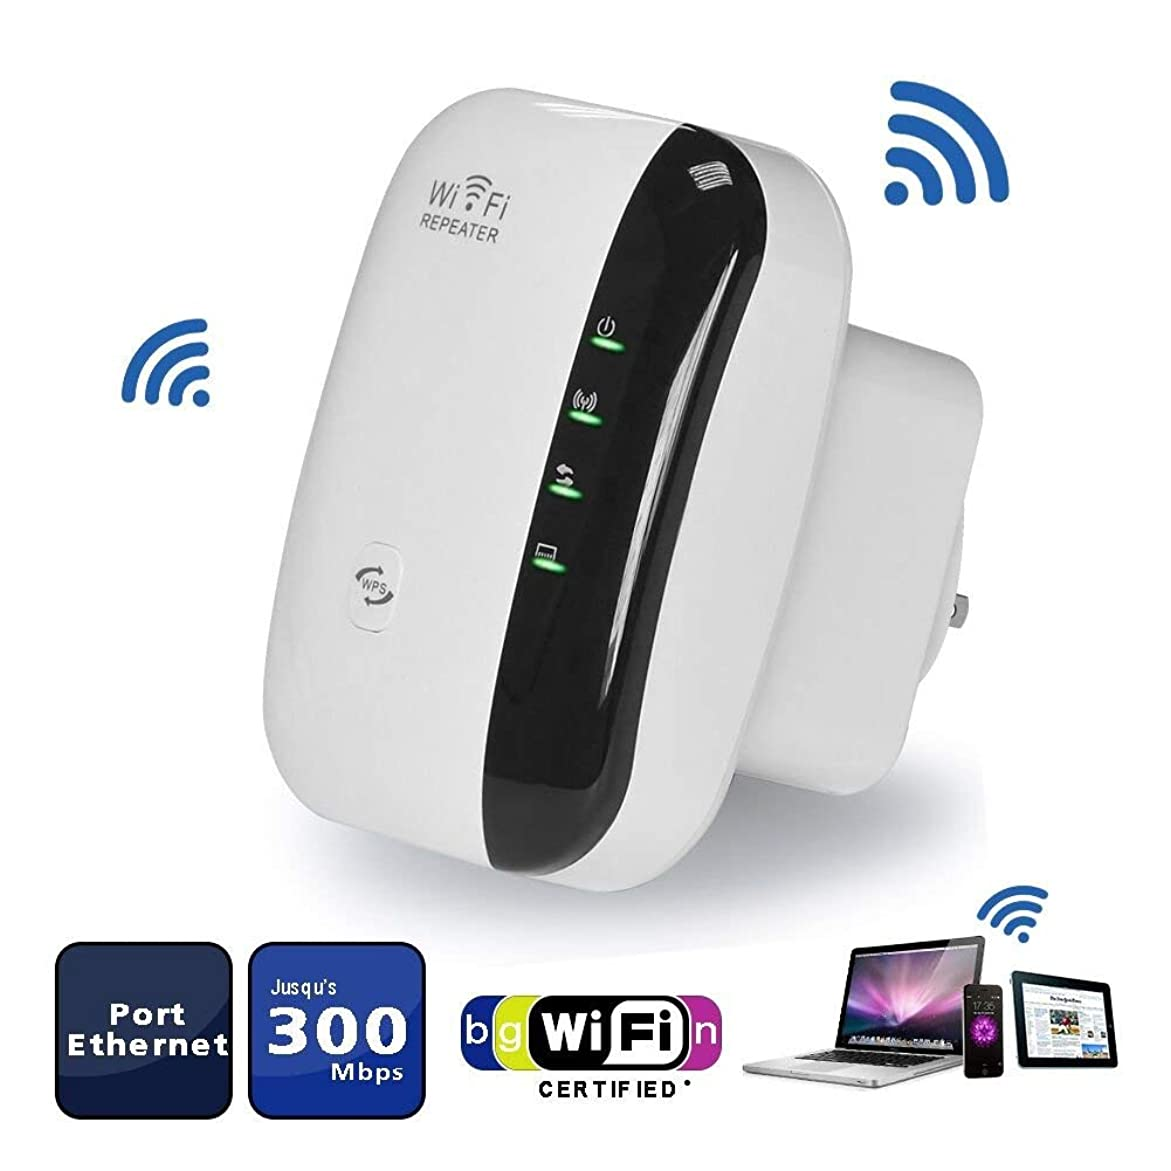 WiFi Range Extender Repeater、Aigital Wireless Repeater Easy Setupはリピーター/アクセスポイントモードをサポートし、Wifi信号を延長します